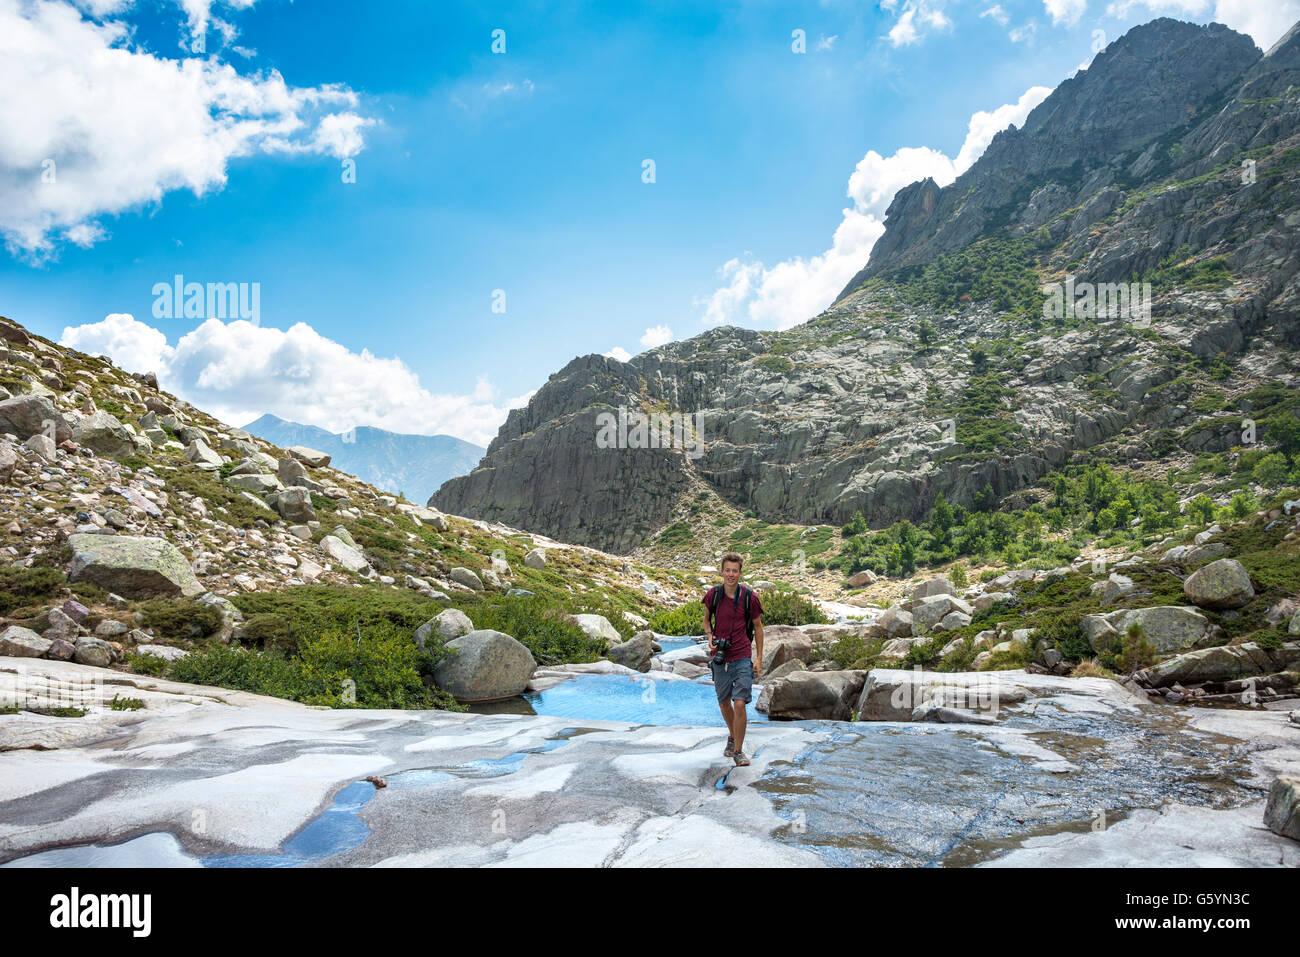 Junger Mann, Wandern durch den Fluss Golo in die Berge, Natur Naturpark von Korsika, Parc Naturel Régional Stockbild